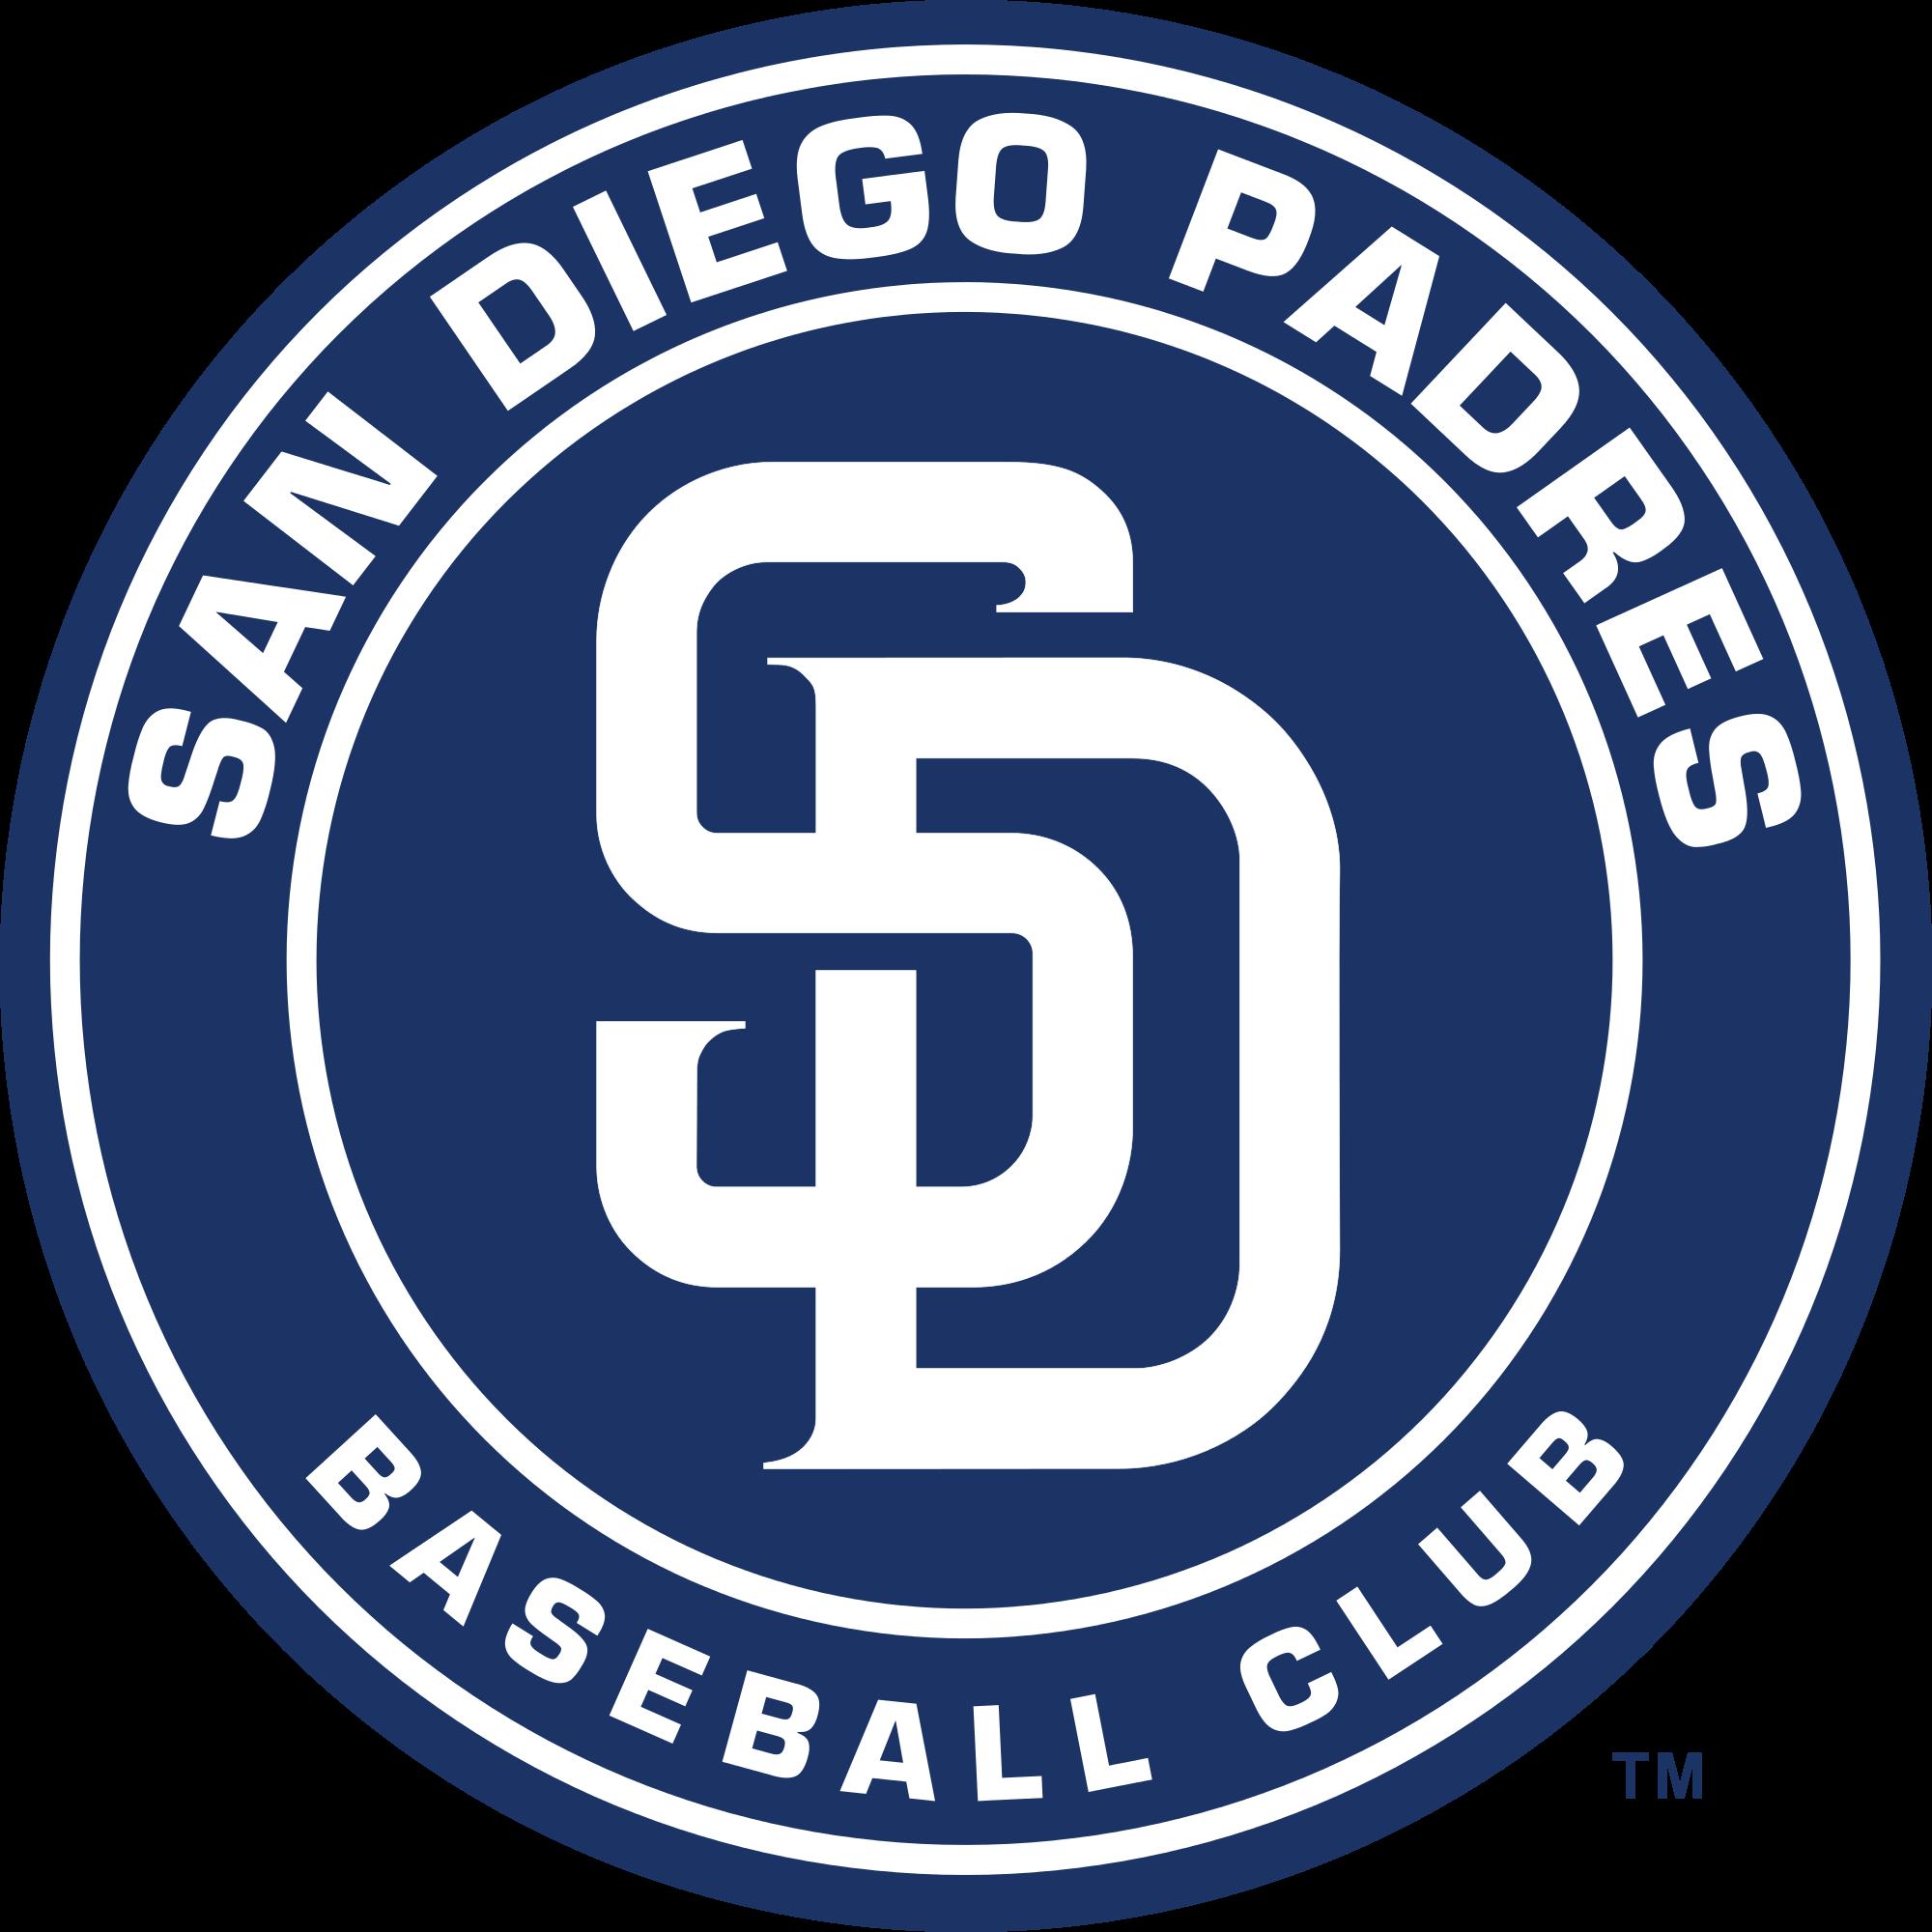 San_Diego_Padres_logo.svg.png